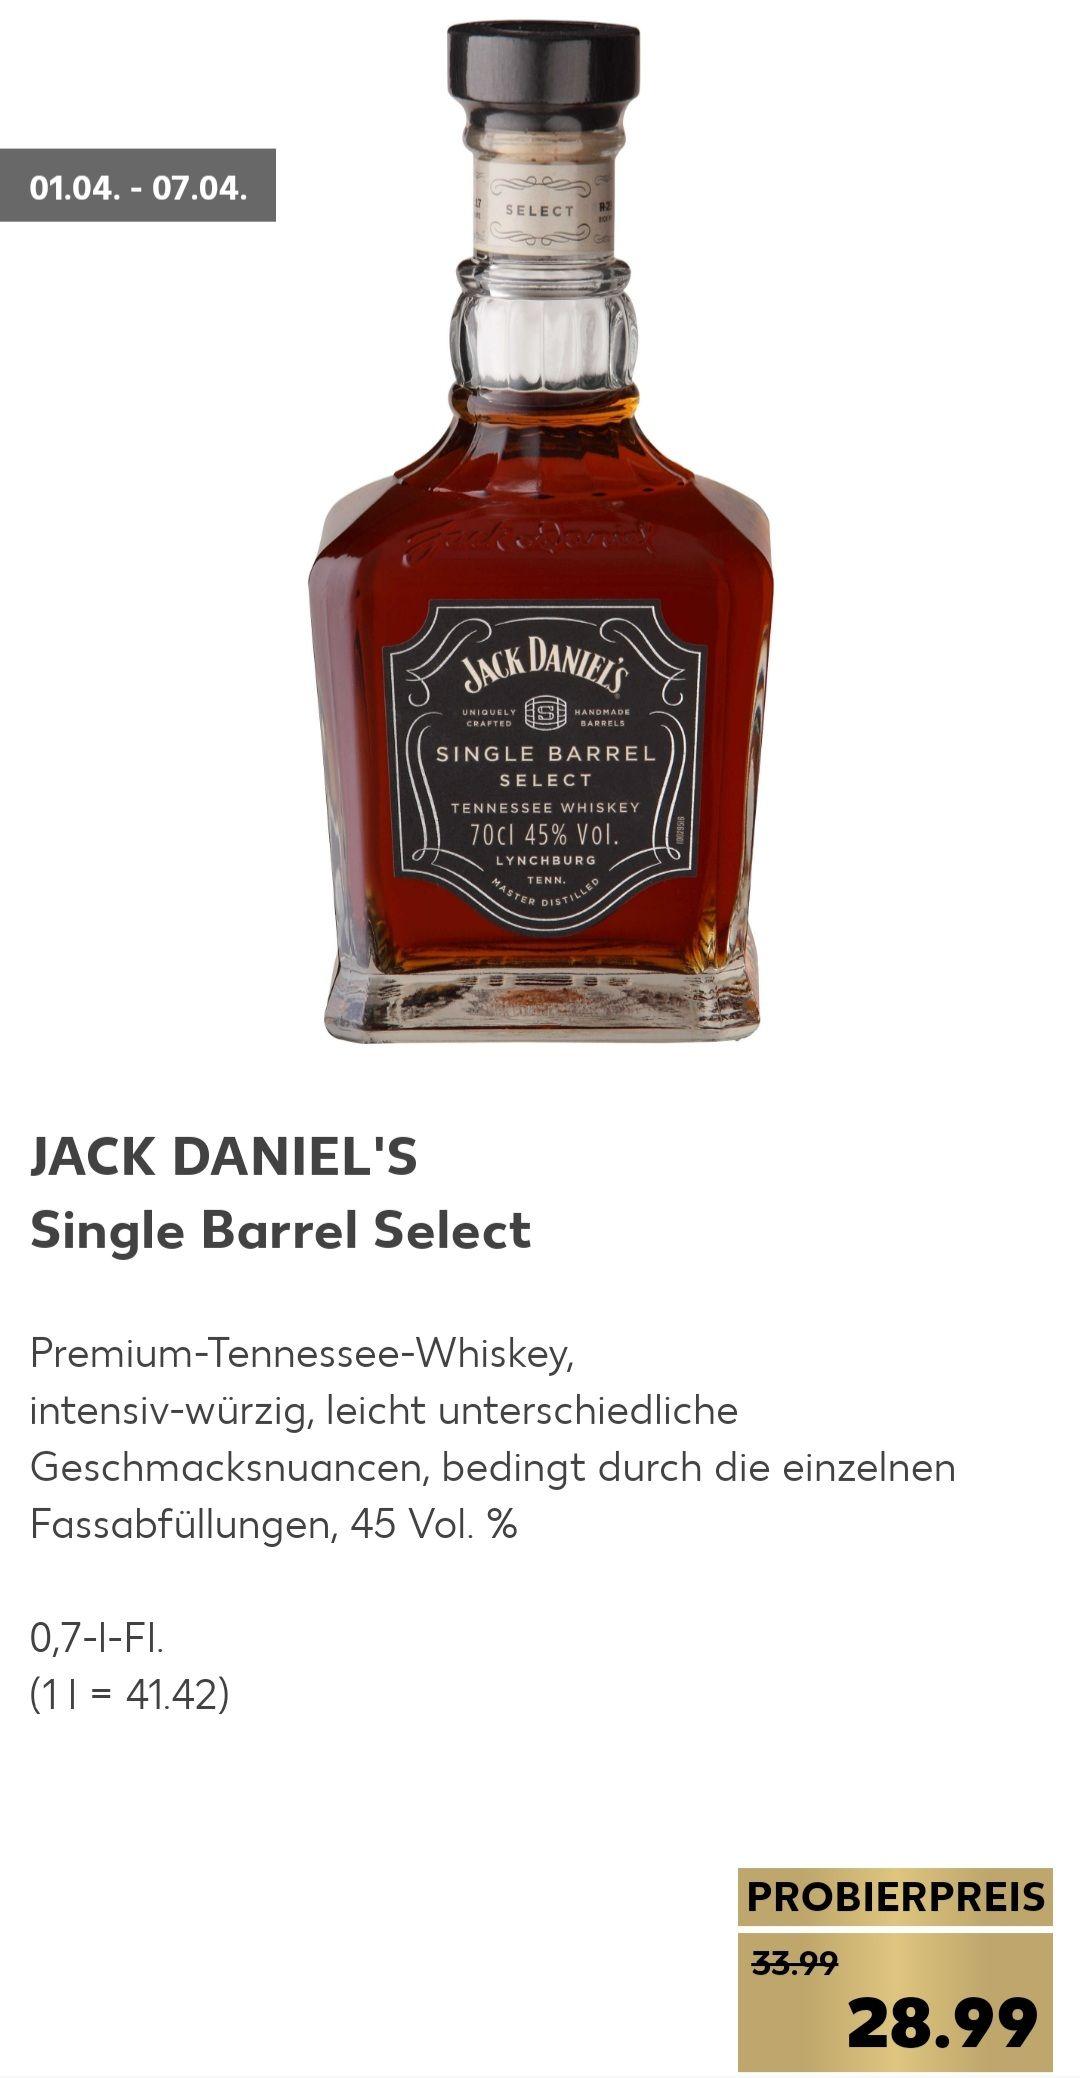 (Kaufland) Jack Daniel's Single Barrel Select